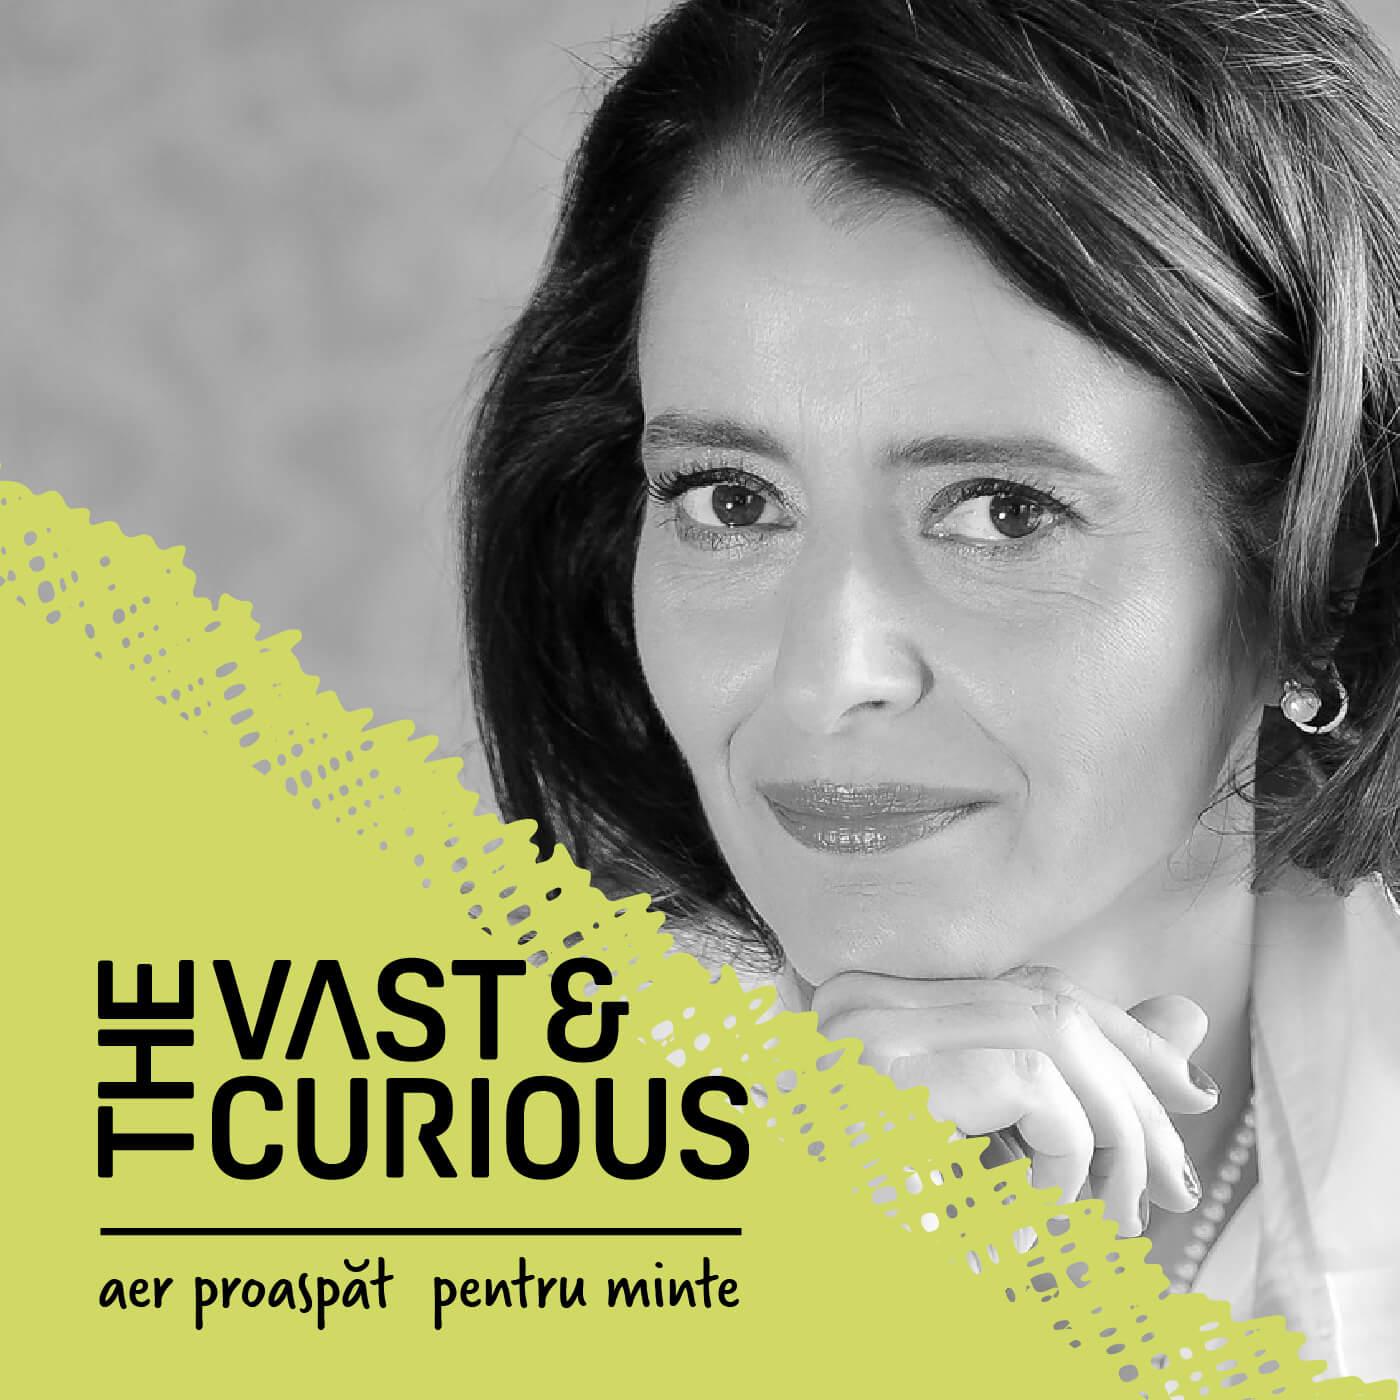 Vast and Curious, cu Andreea Roșca show art